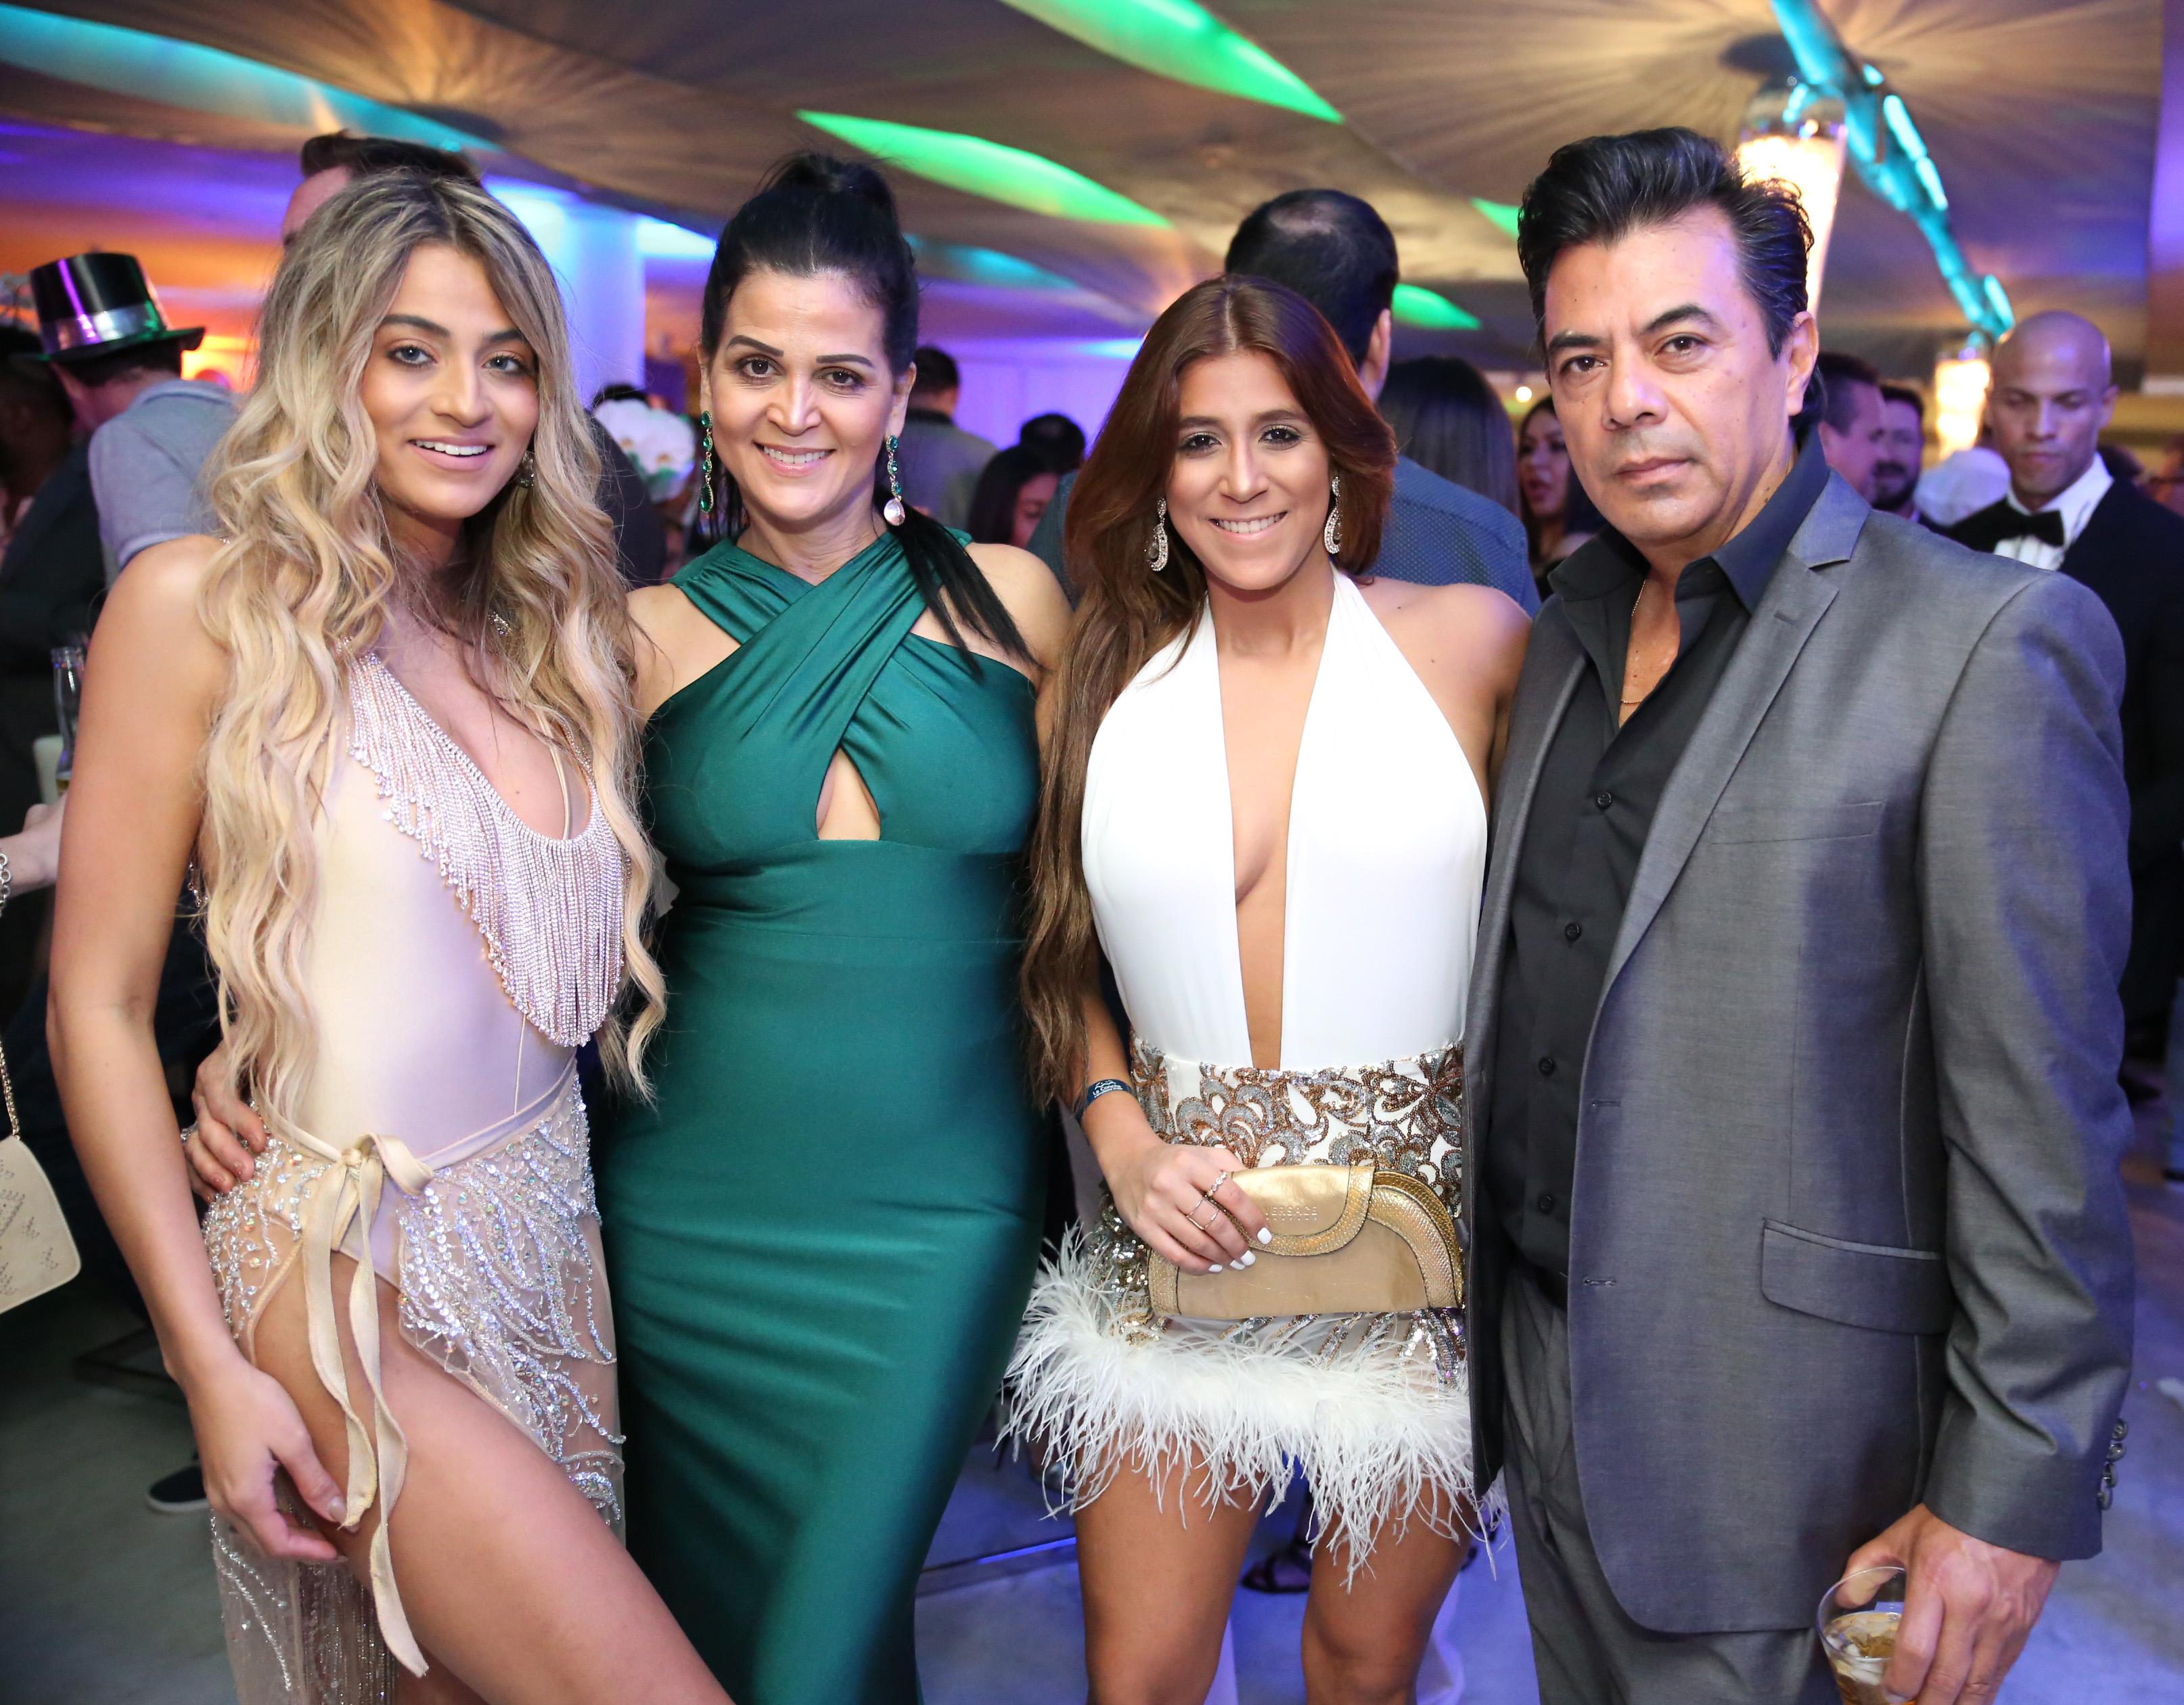 Marcela Salazar, Yanira Reyes, Valentina Salazar y Giovanni Salazar. Suministradas